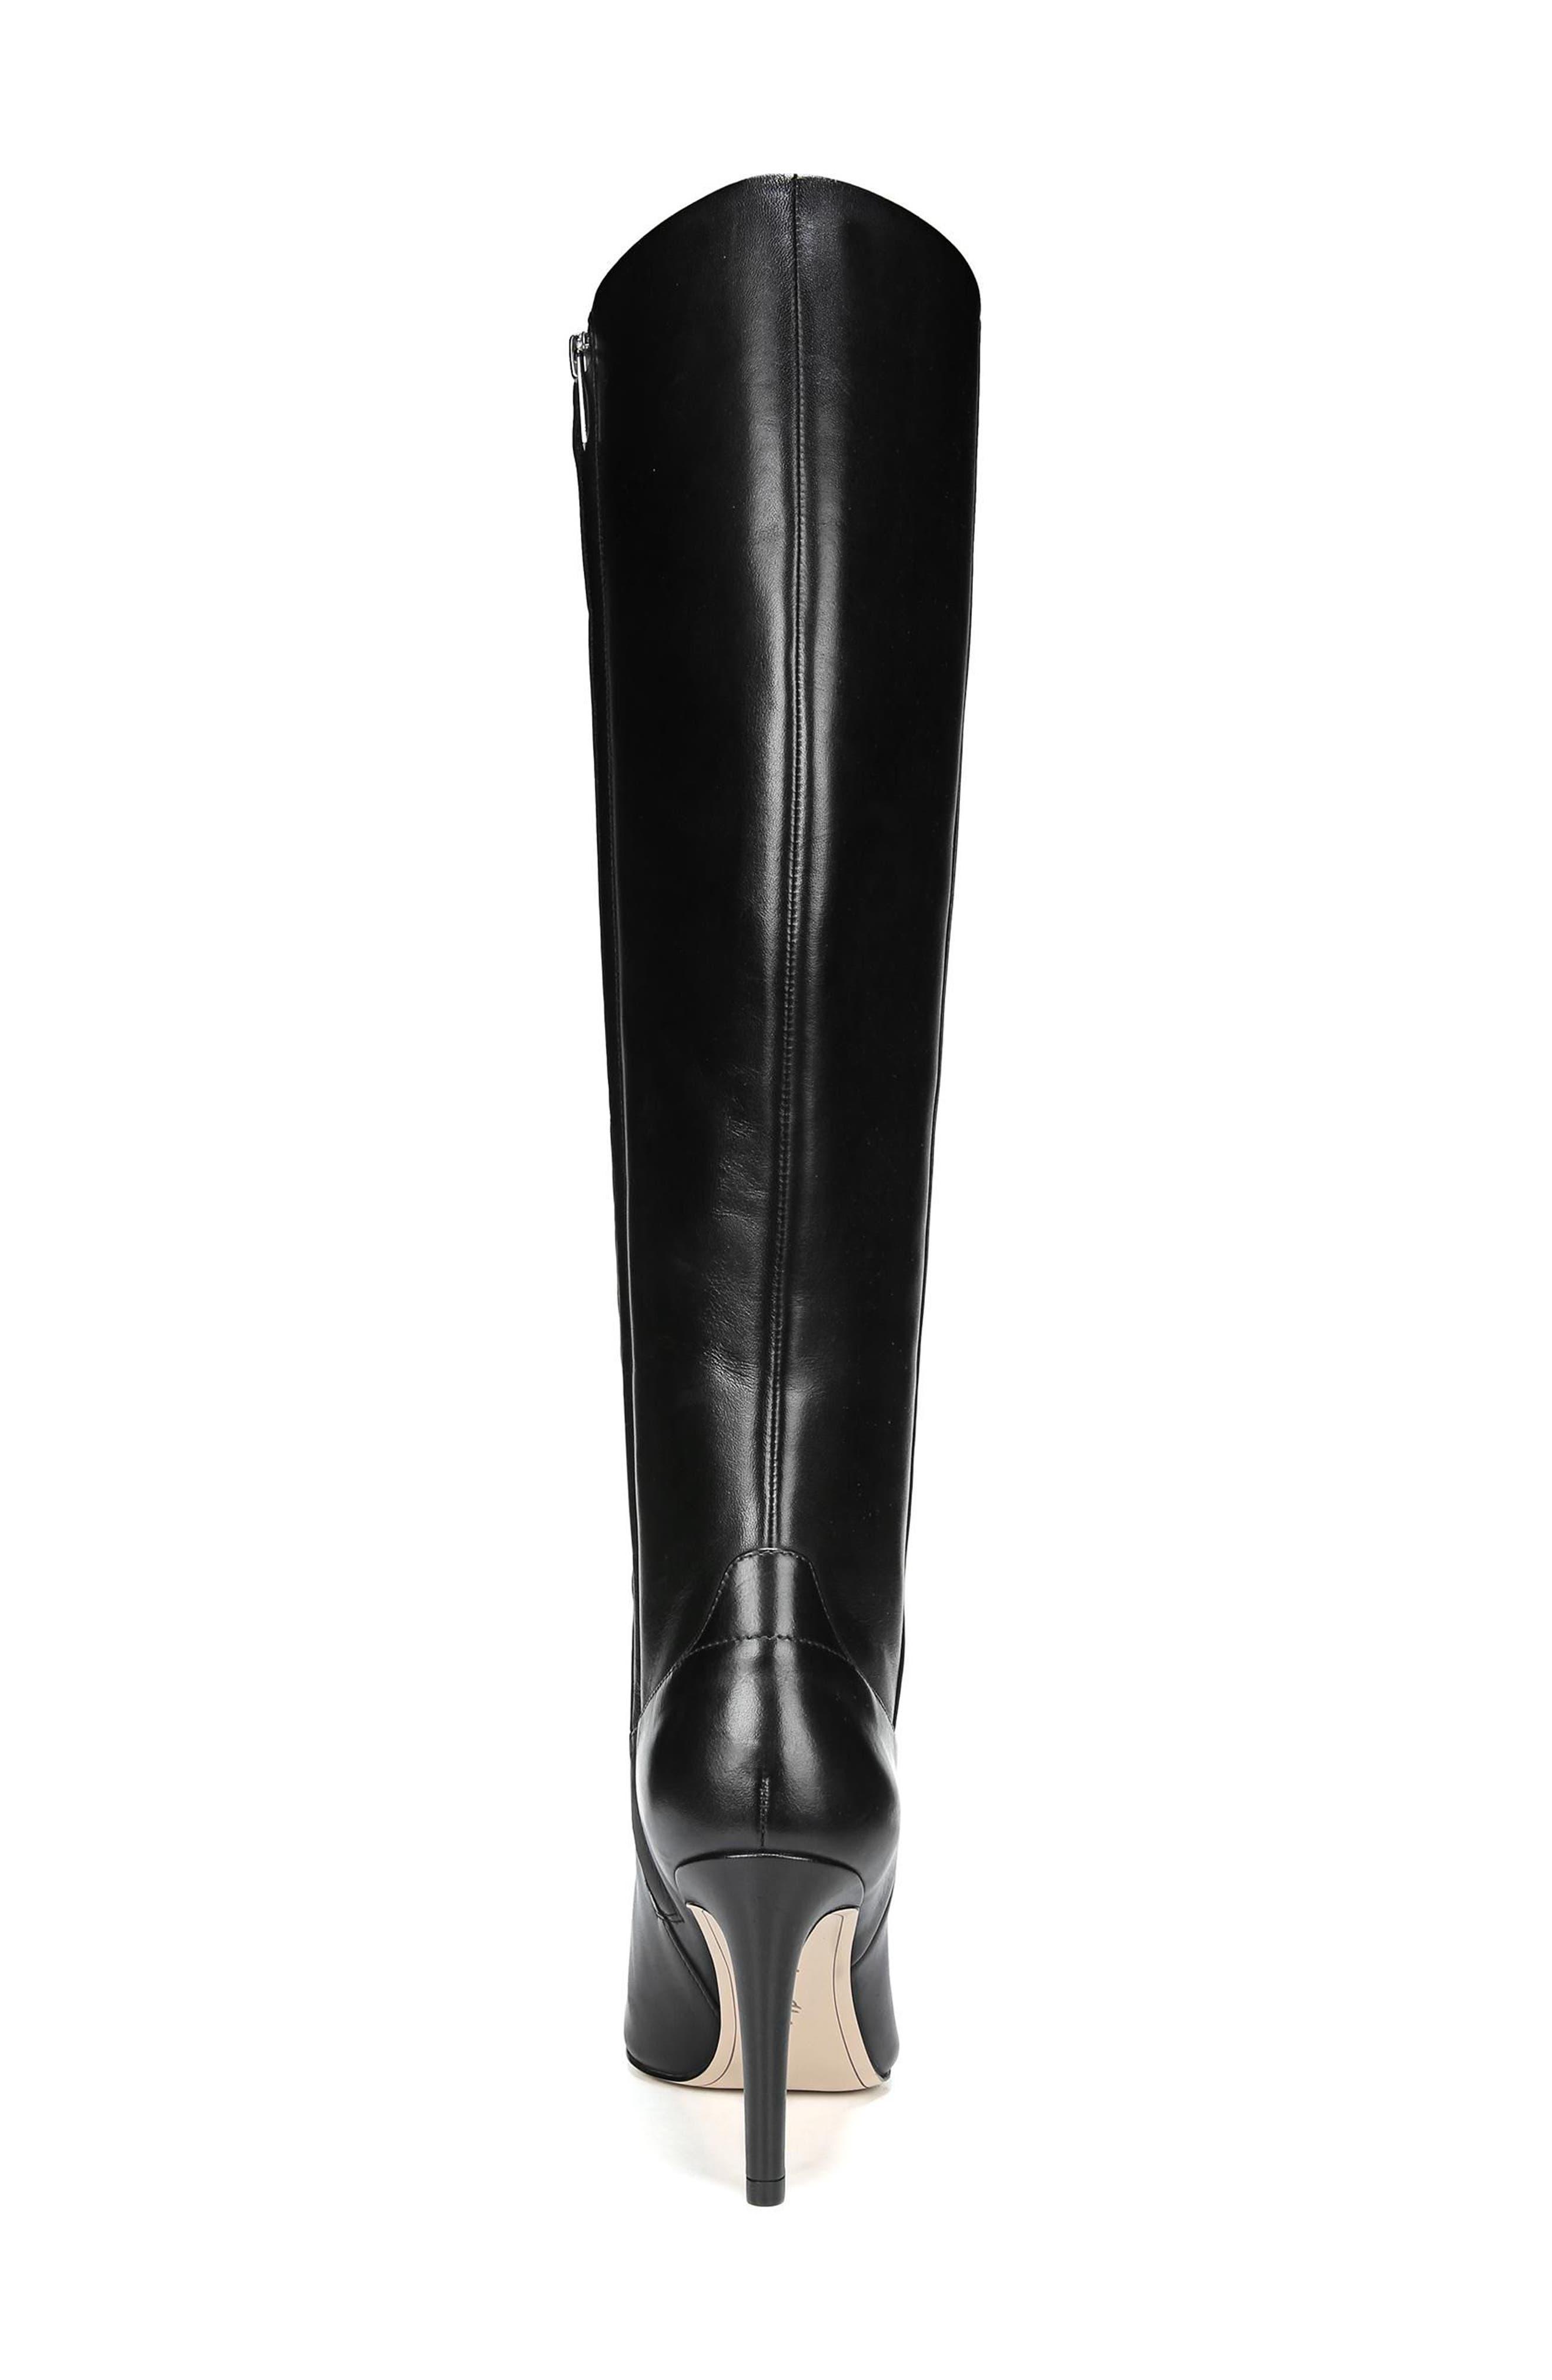 Olencia Knee High Boot,                             Alternate thumbnail 7, color,                             001